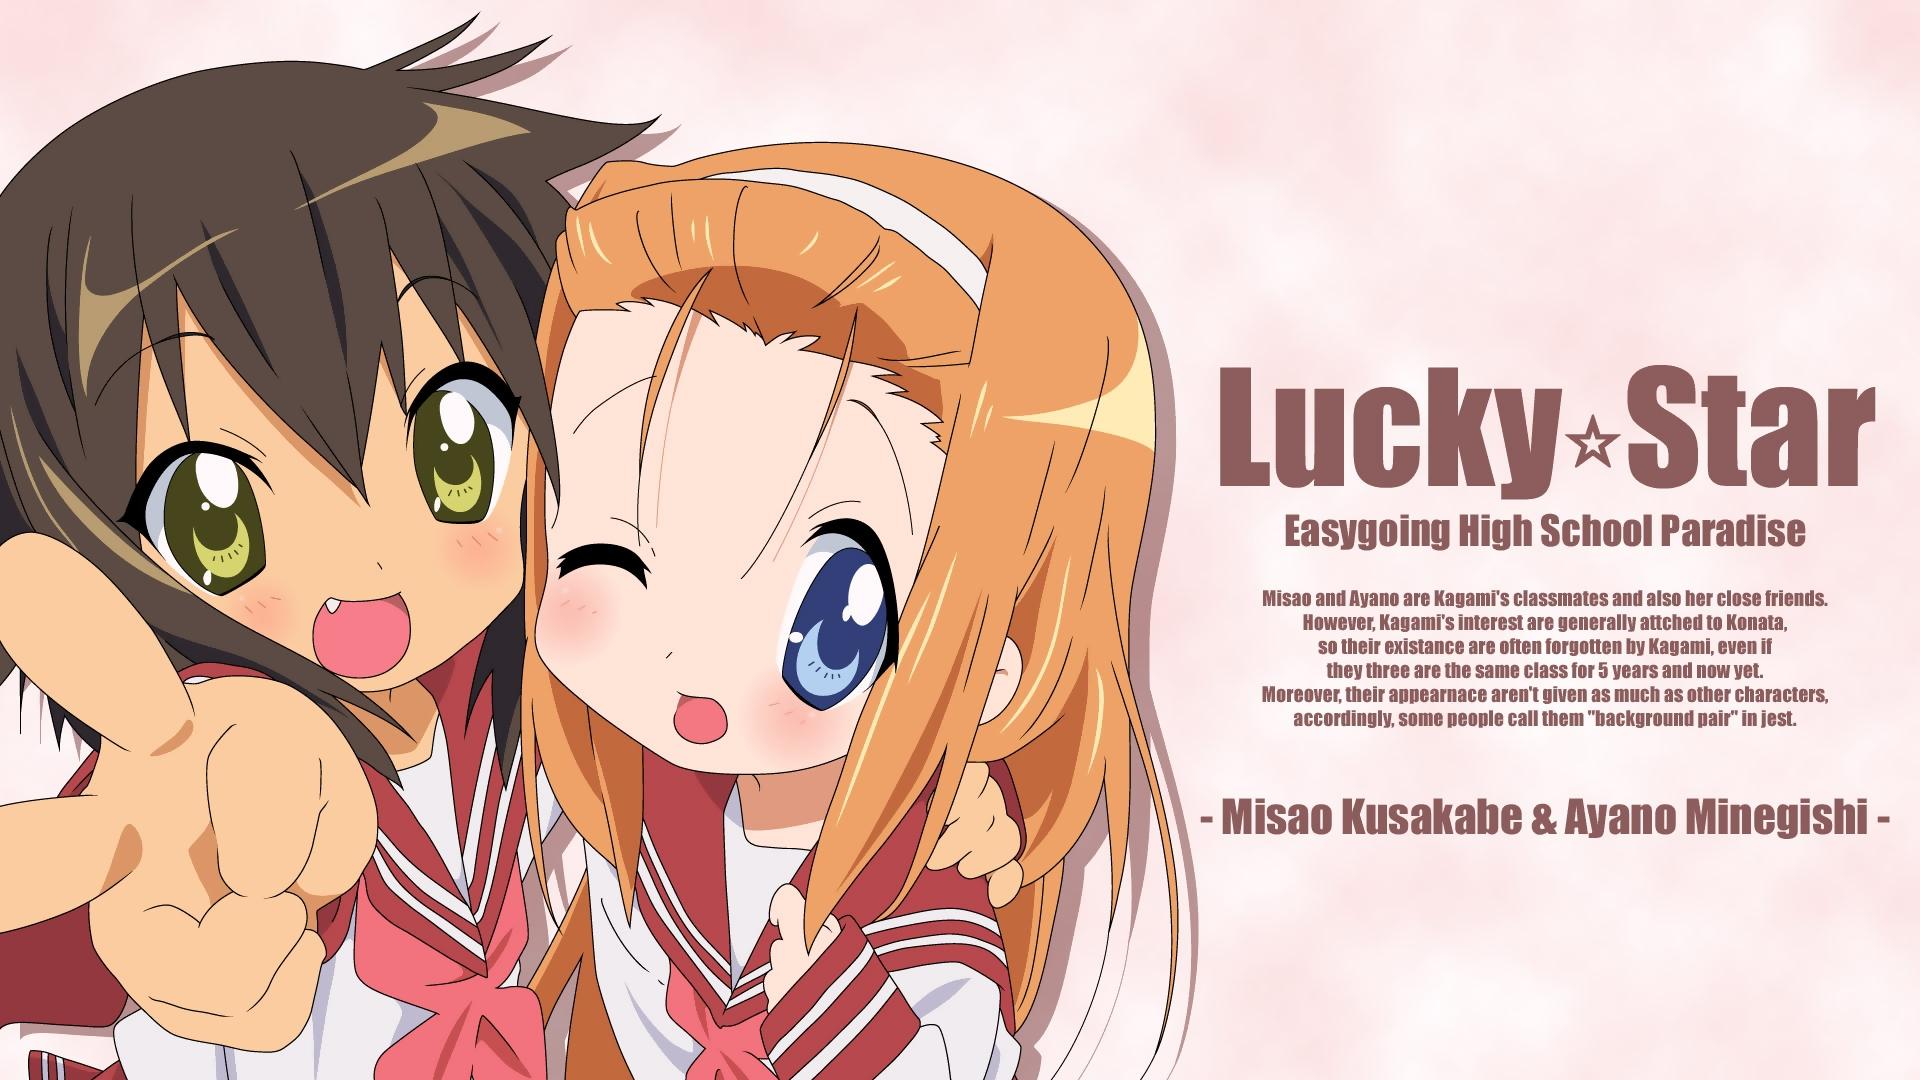 fang kusakabe_misao lucky_star minegishi_ayano